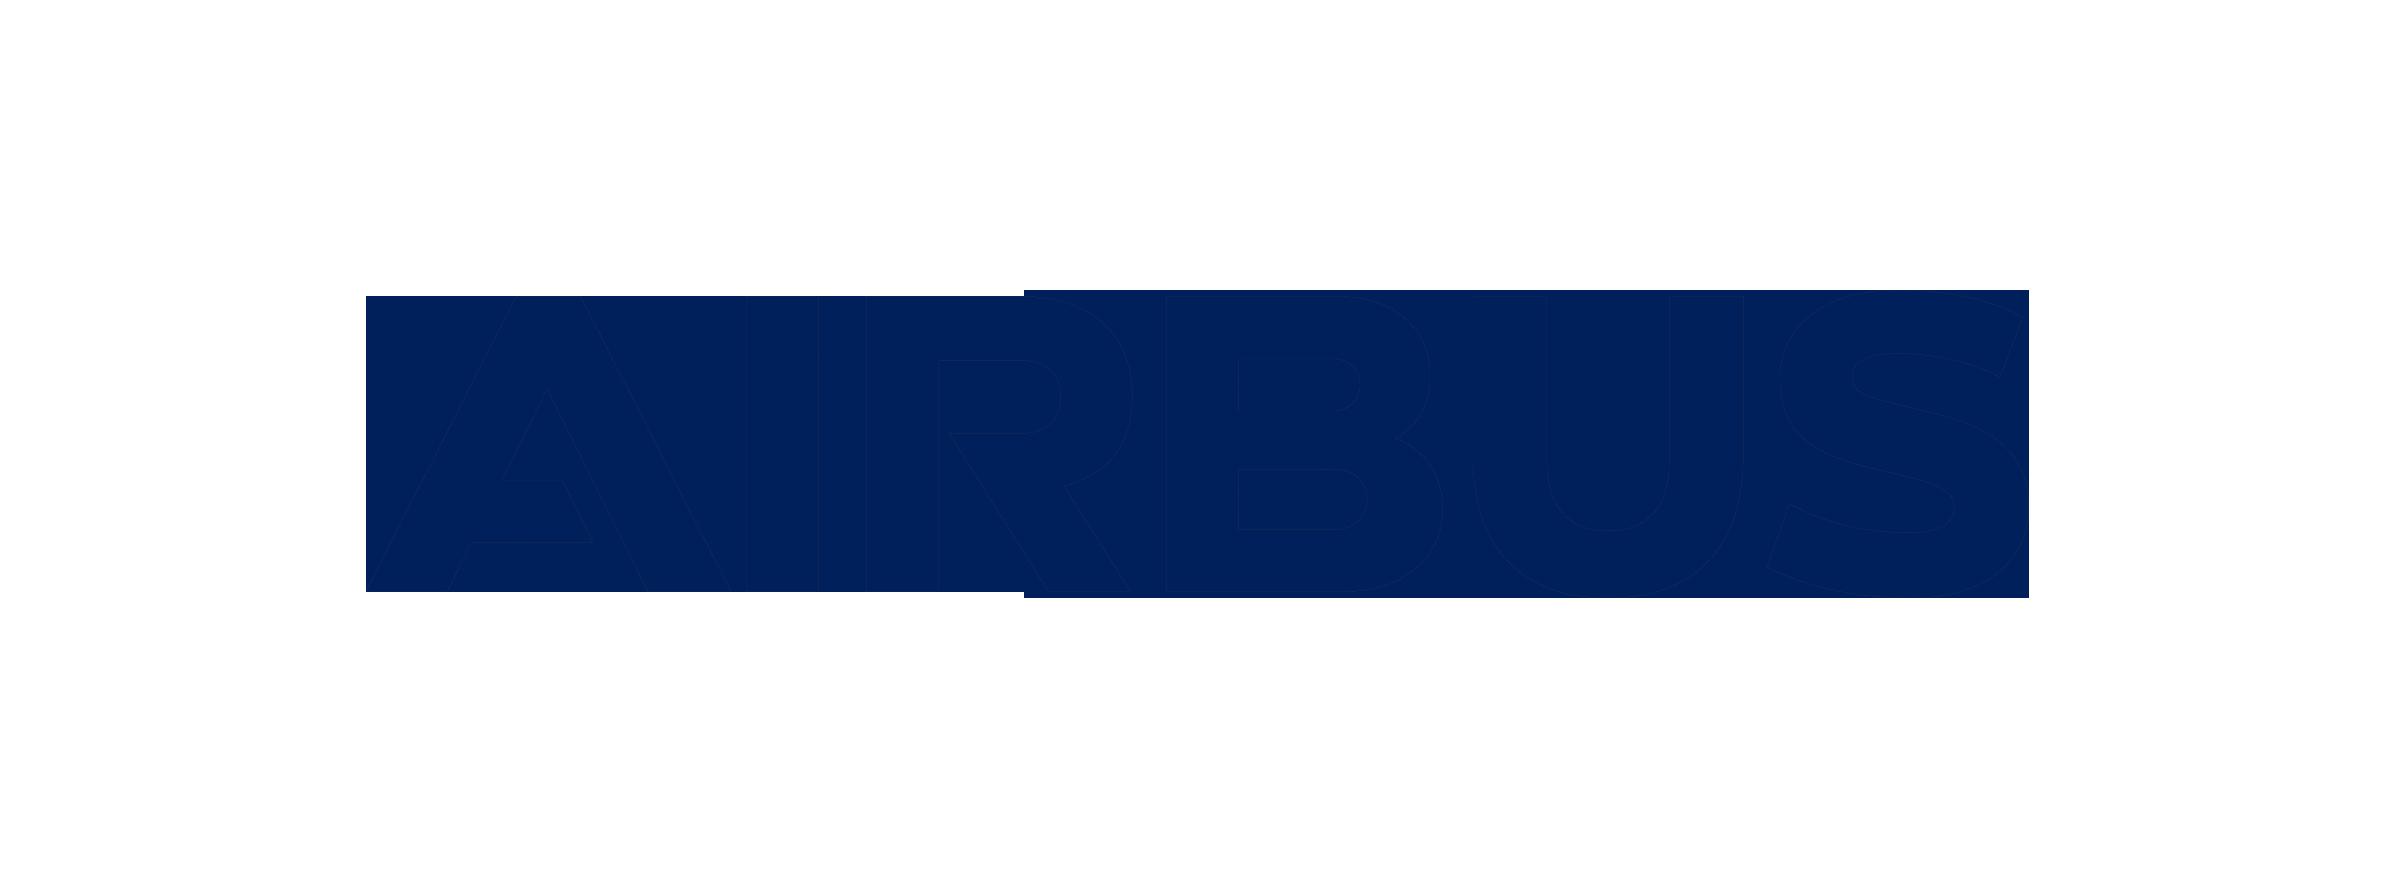 airbus.png